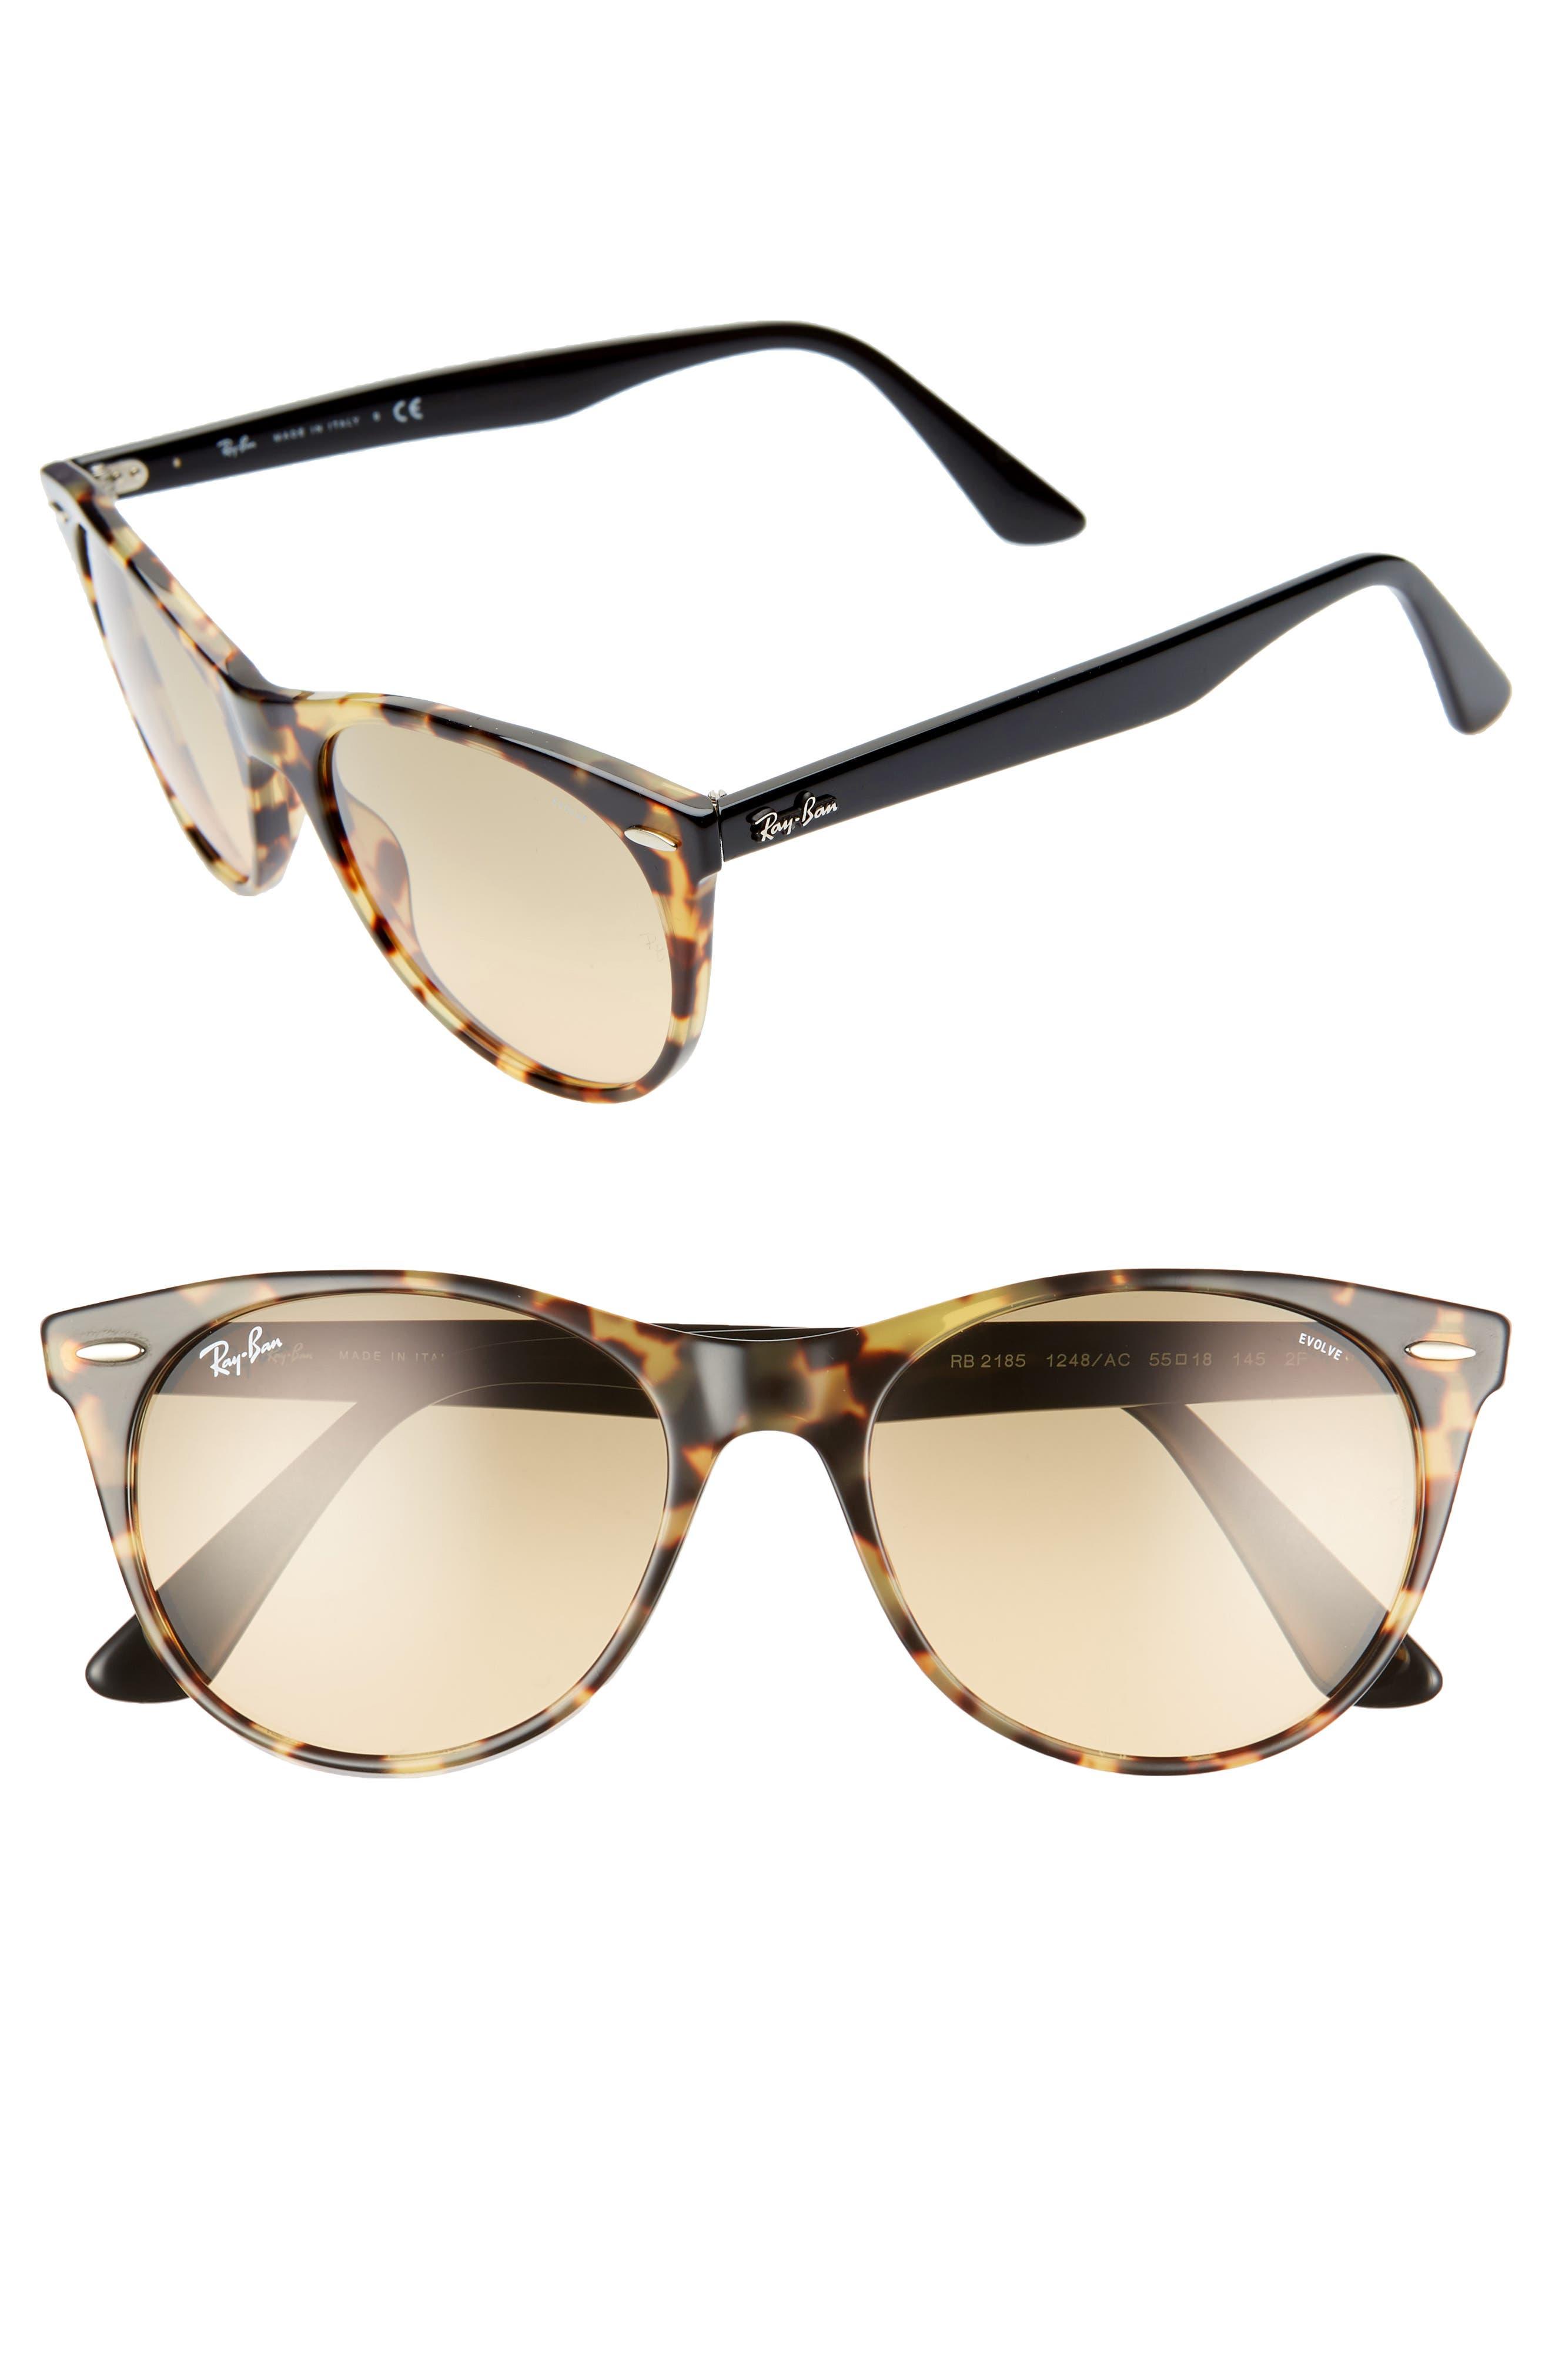 RAY-BAN, Wayfarer II 55mm Polarized Photochromic Sunglasses, Main thumbnail 1, color, 200